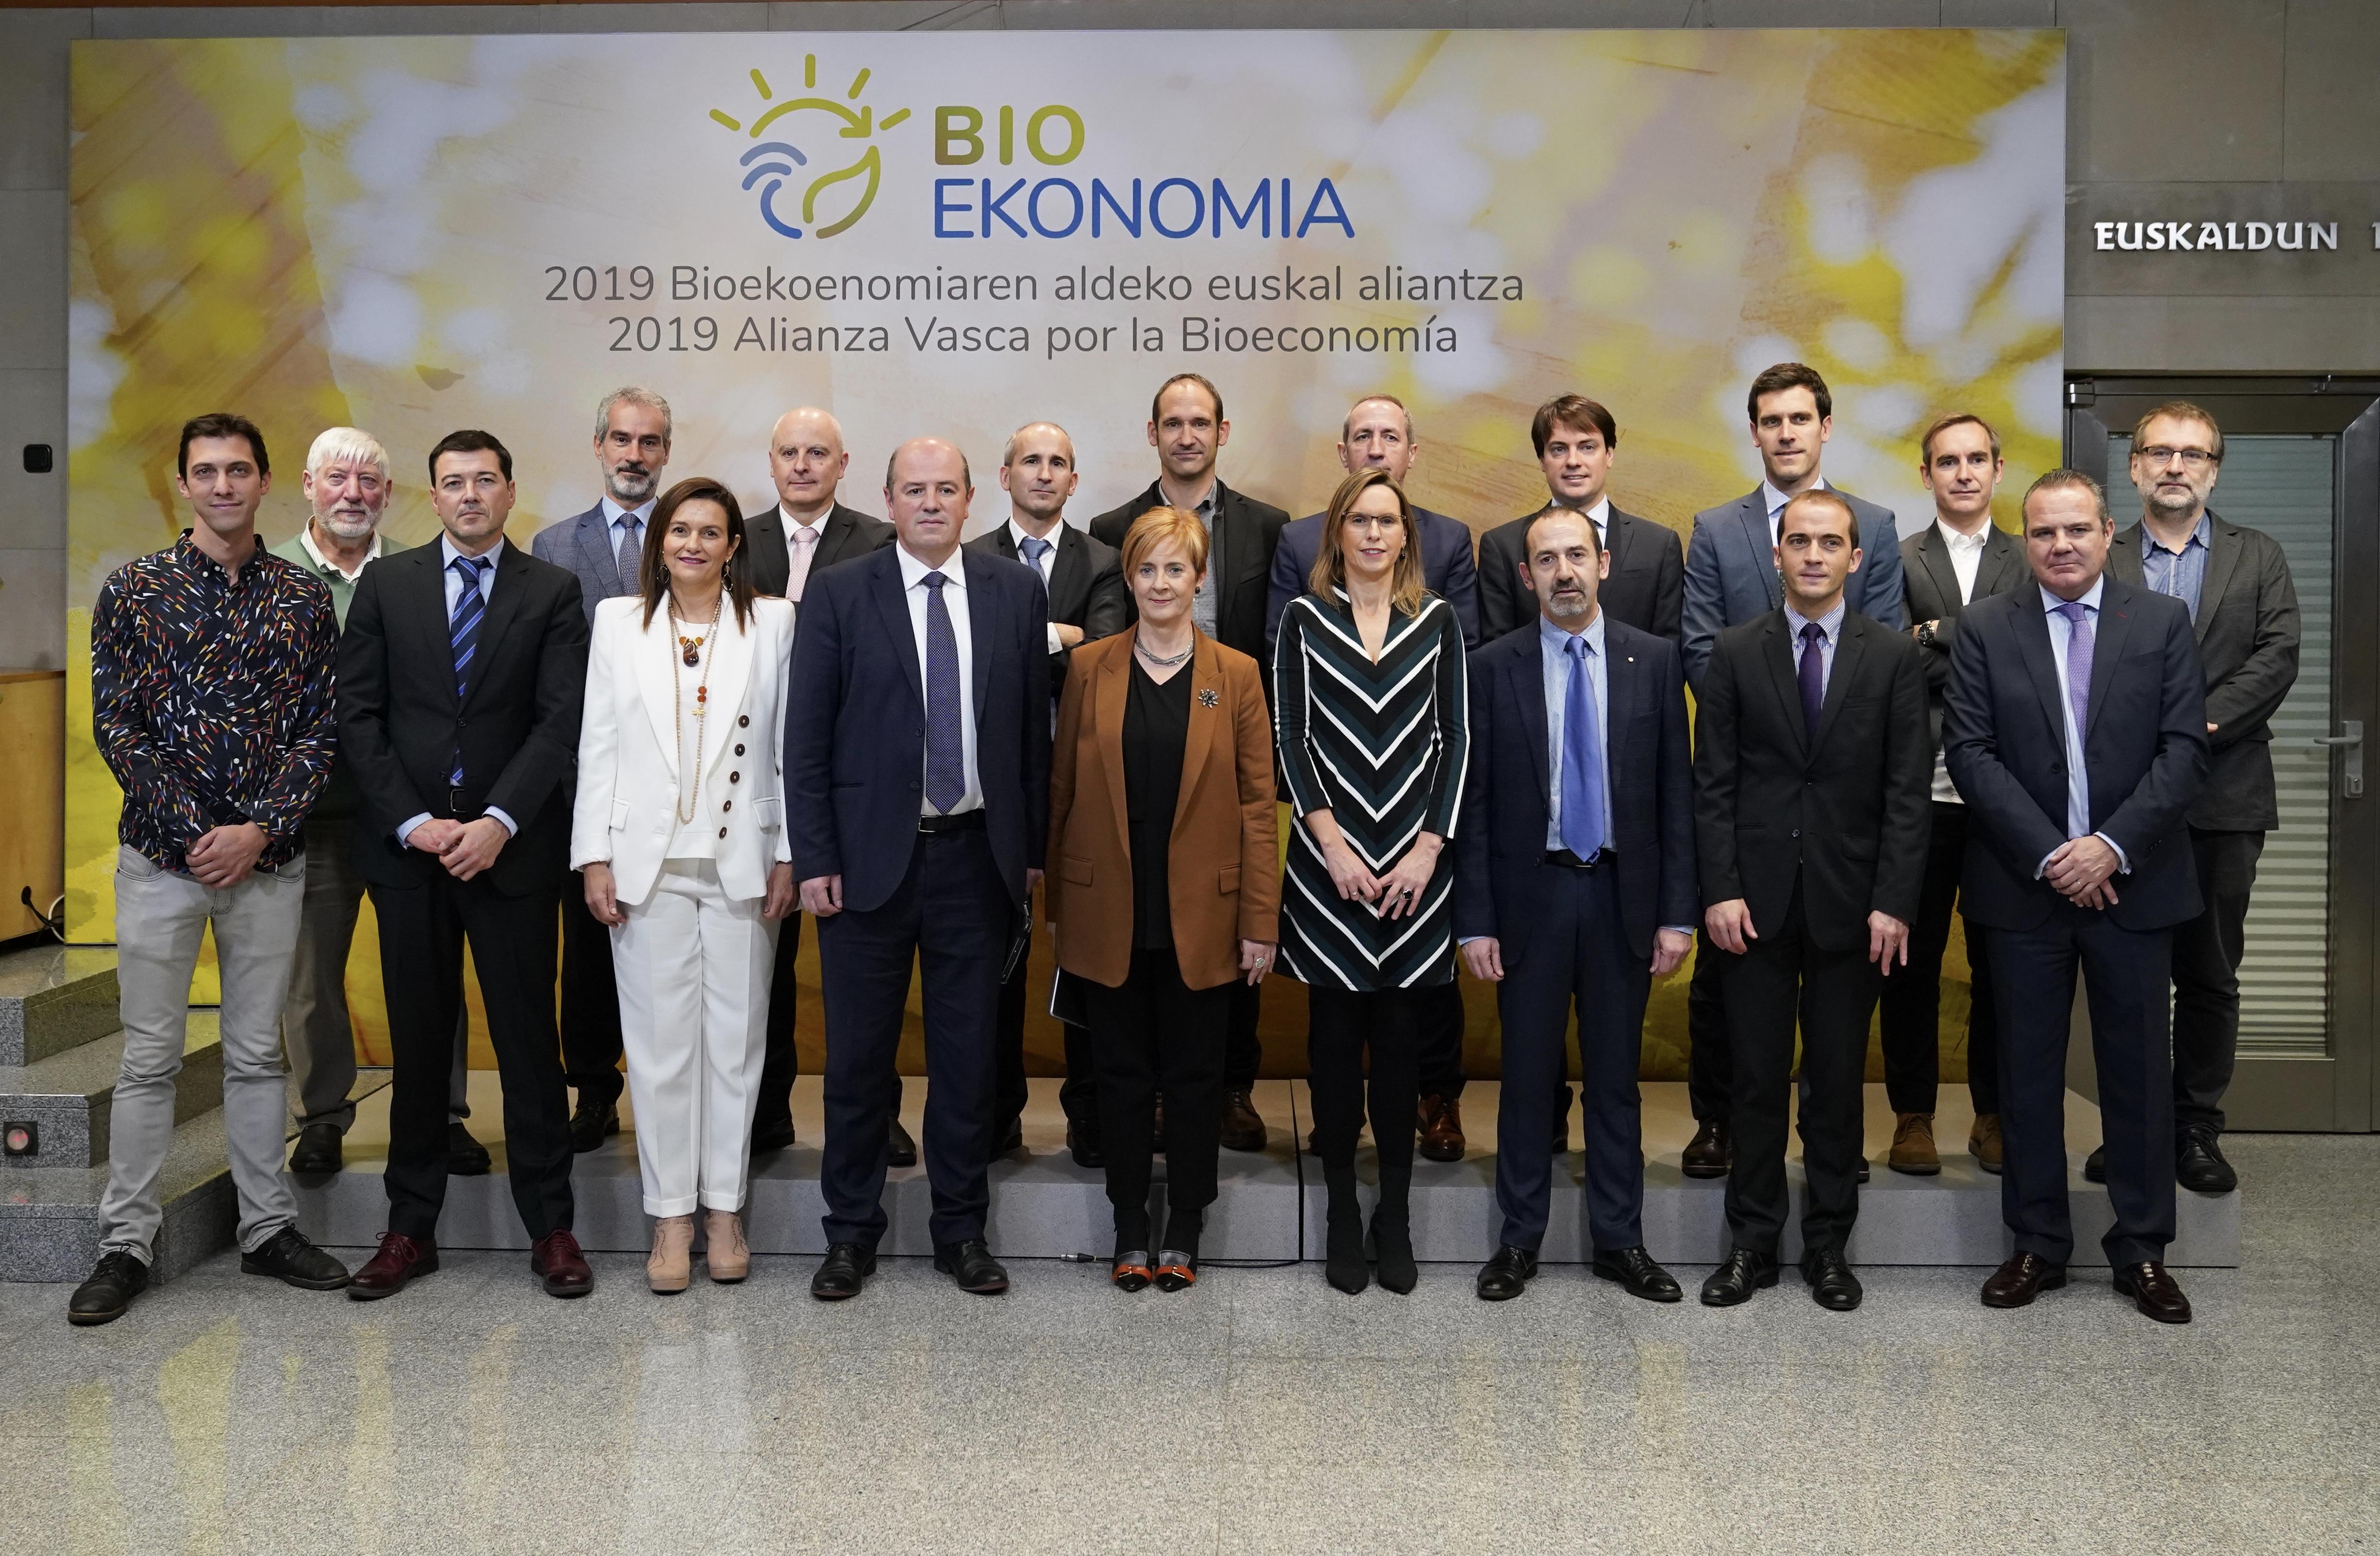 tapia_bioekonomia_01.jpg